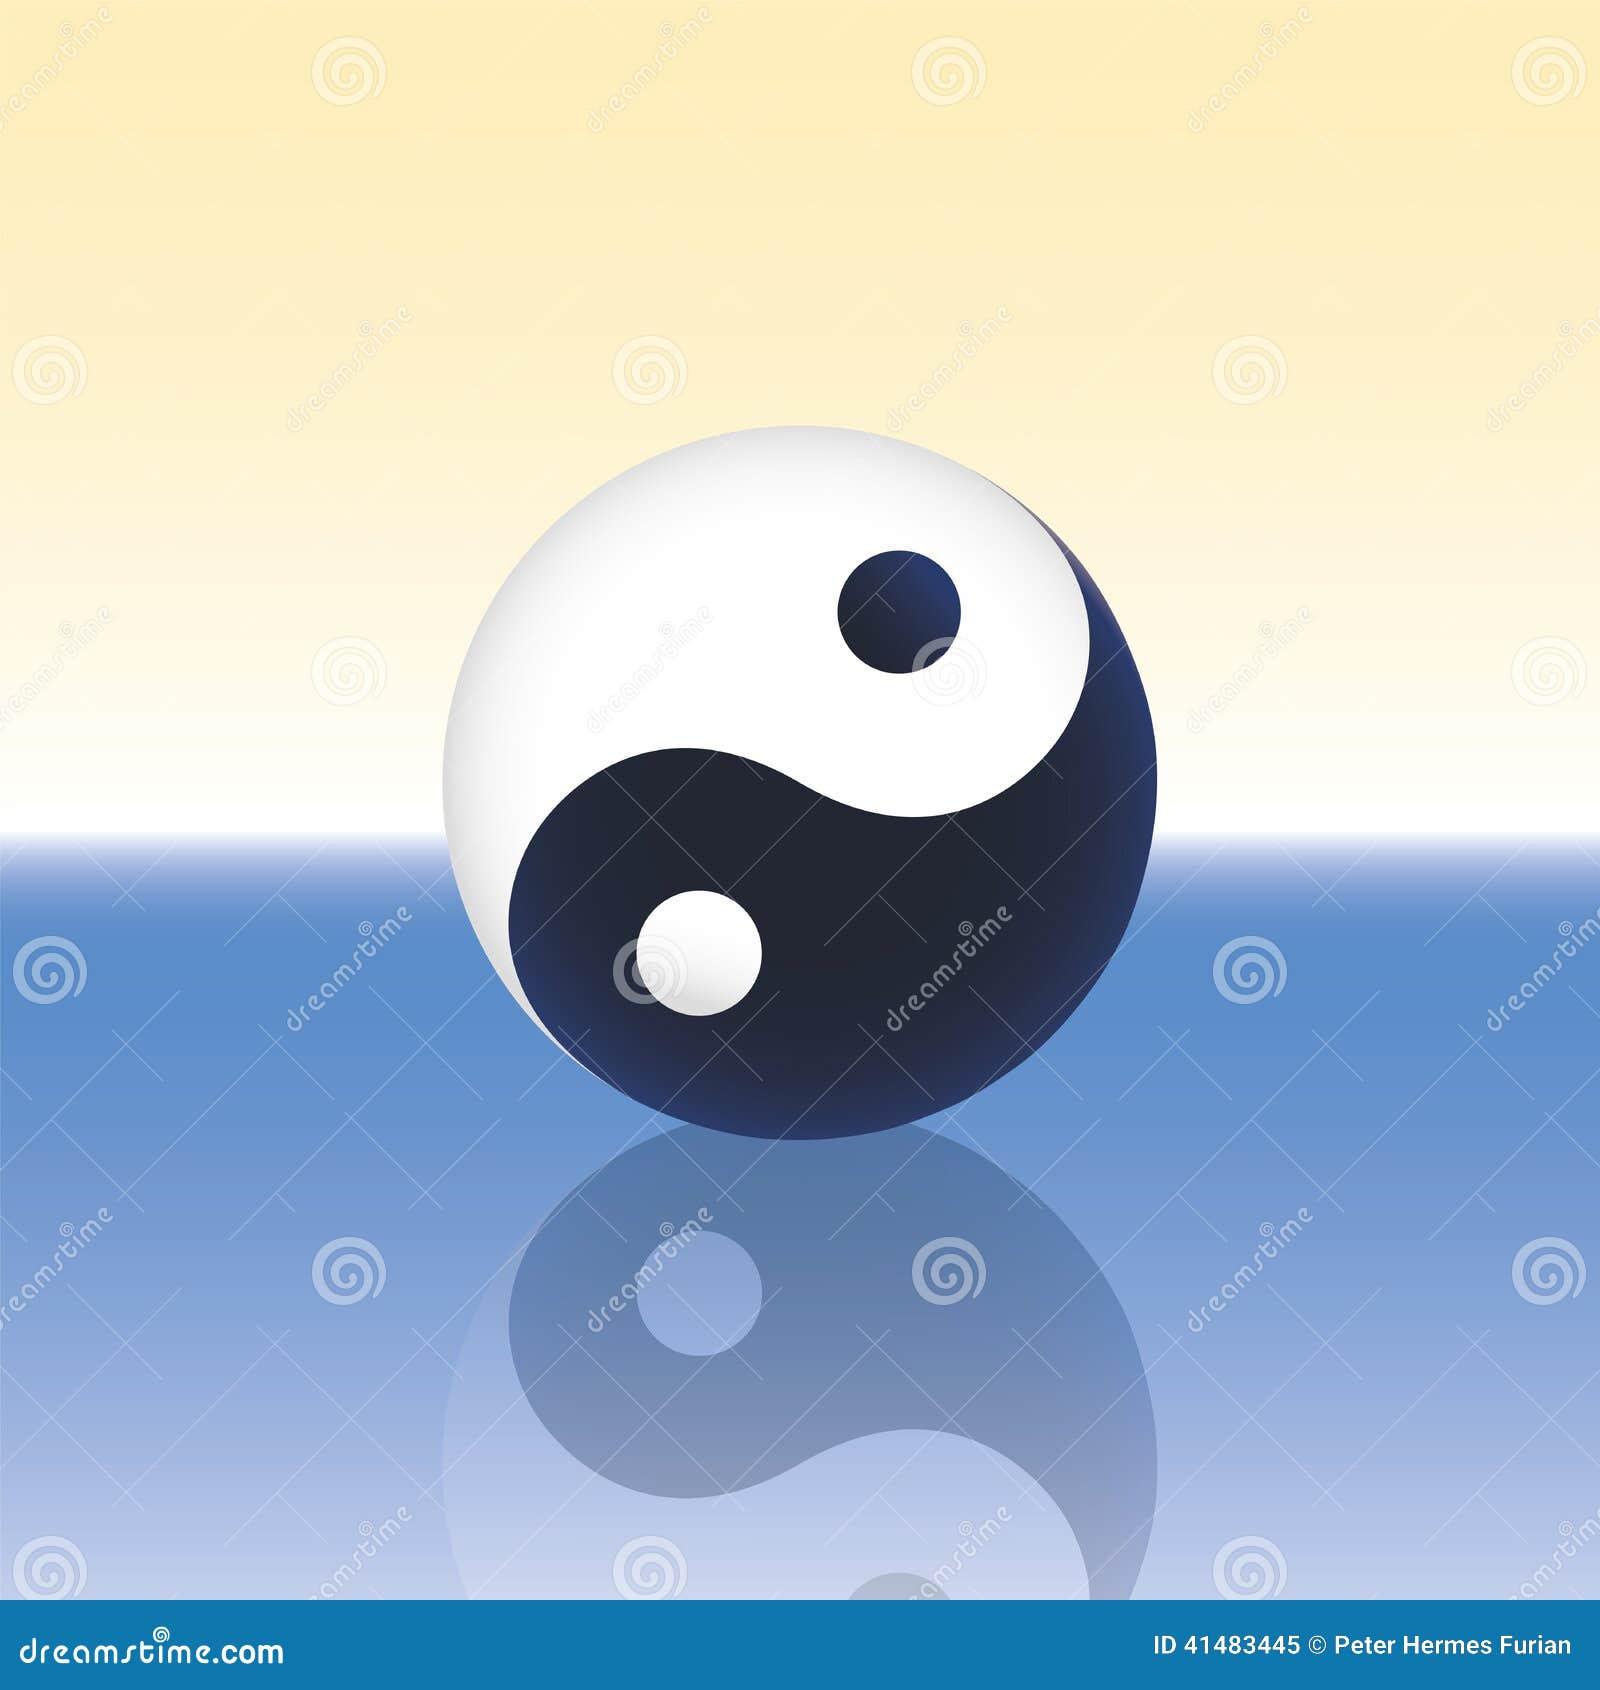 yin yang ocean stock photo image 41483445 Black and White Ying Yang Black and White Yin and Yang Kittens